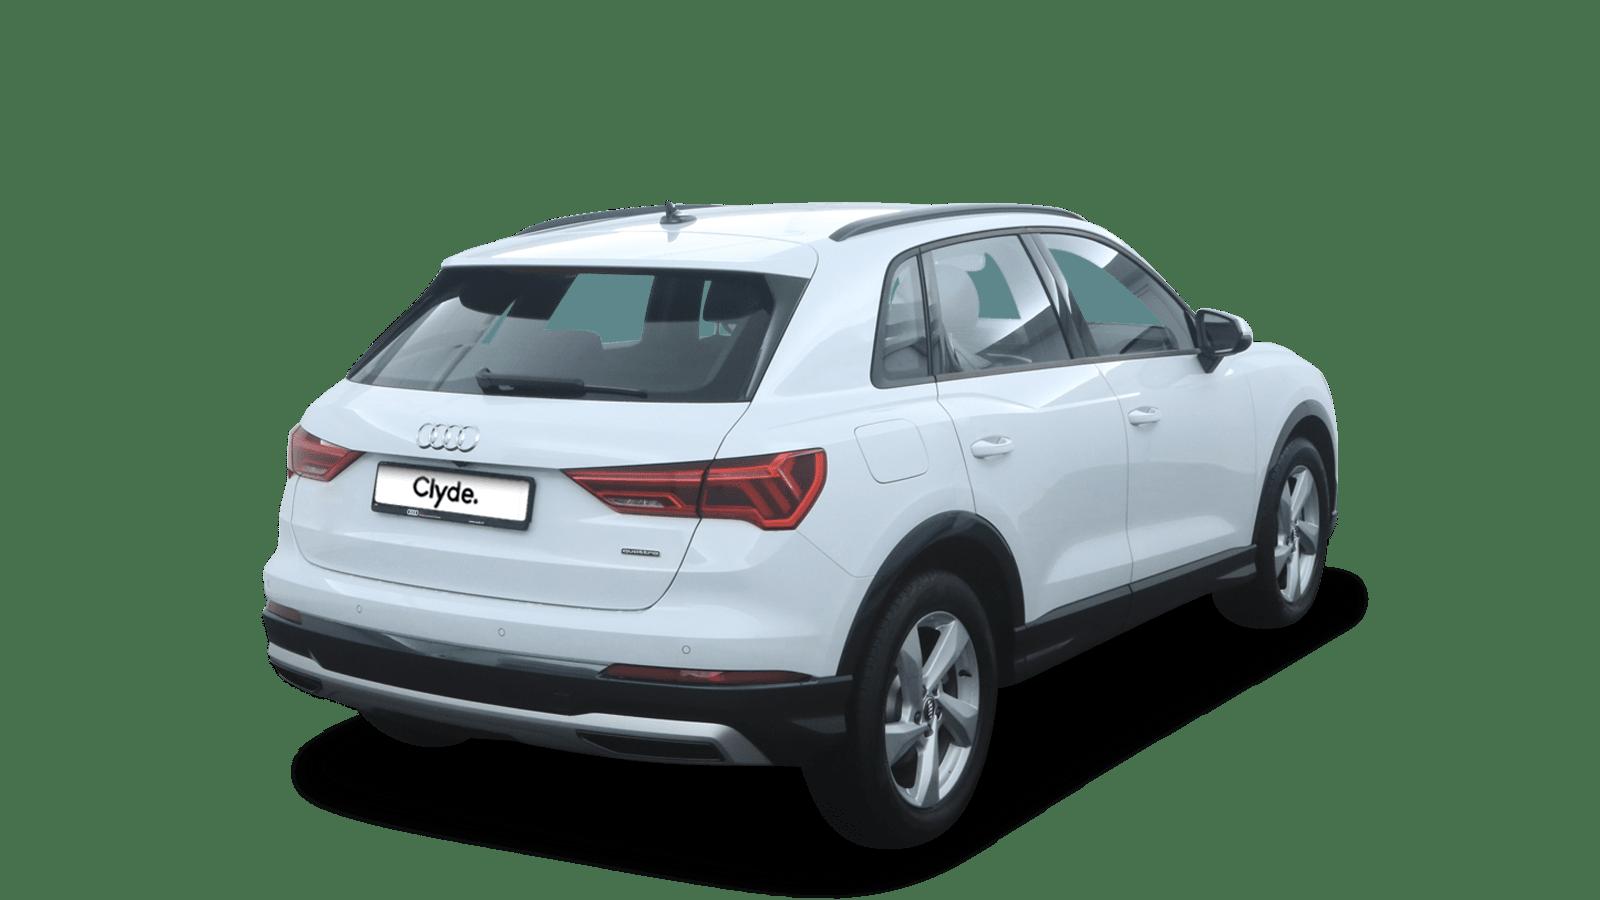 Audi Q3 White back - Clyde car subscription